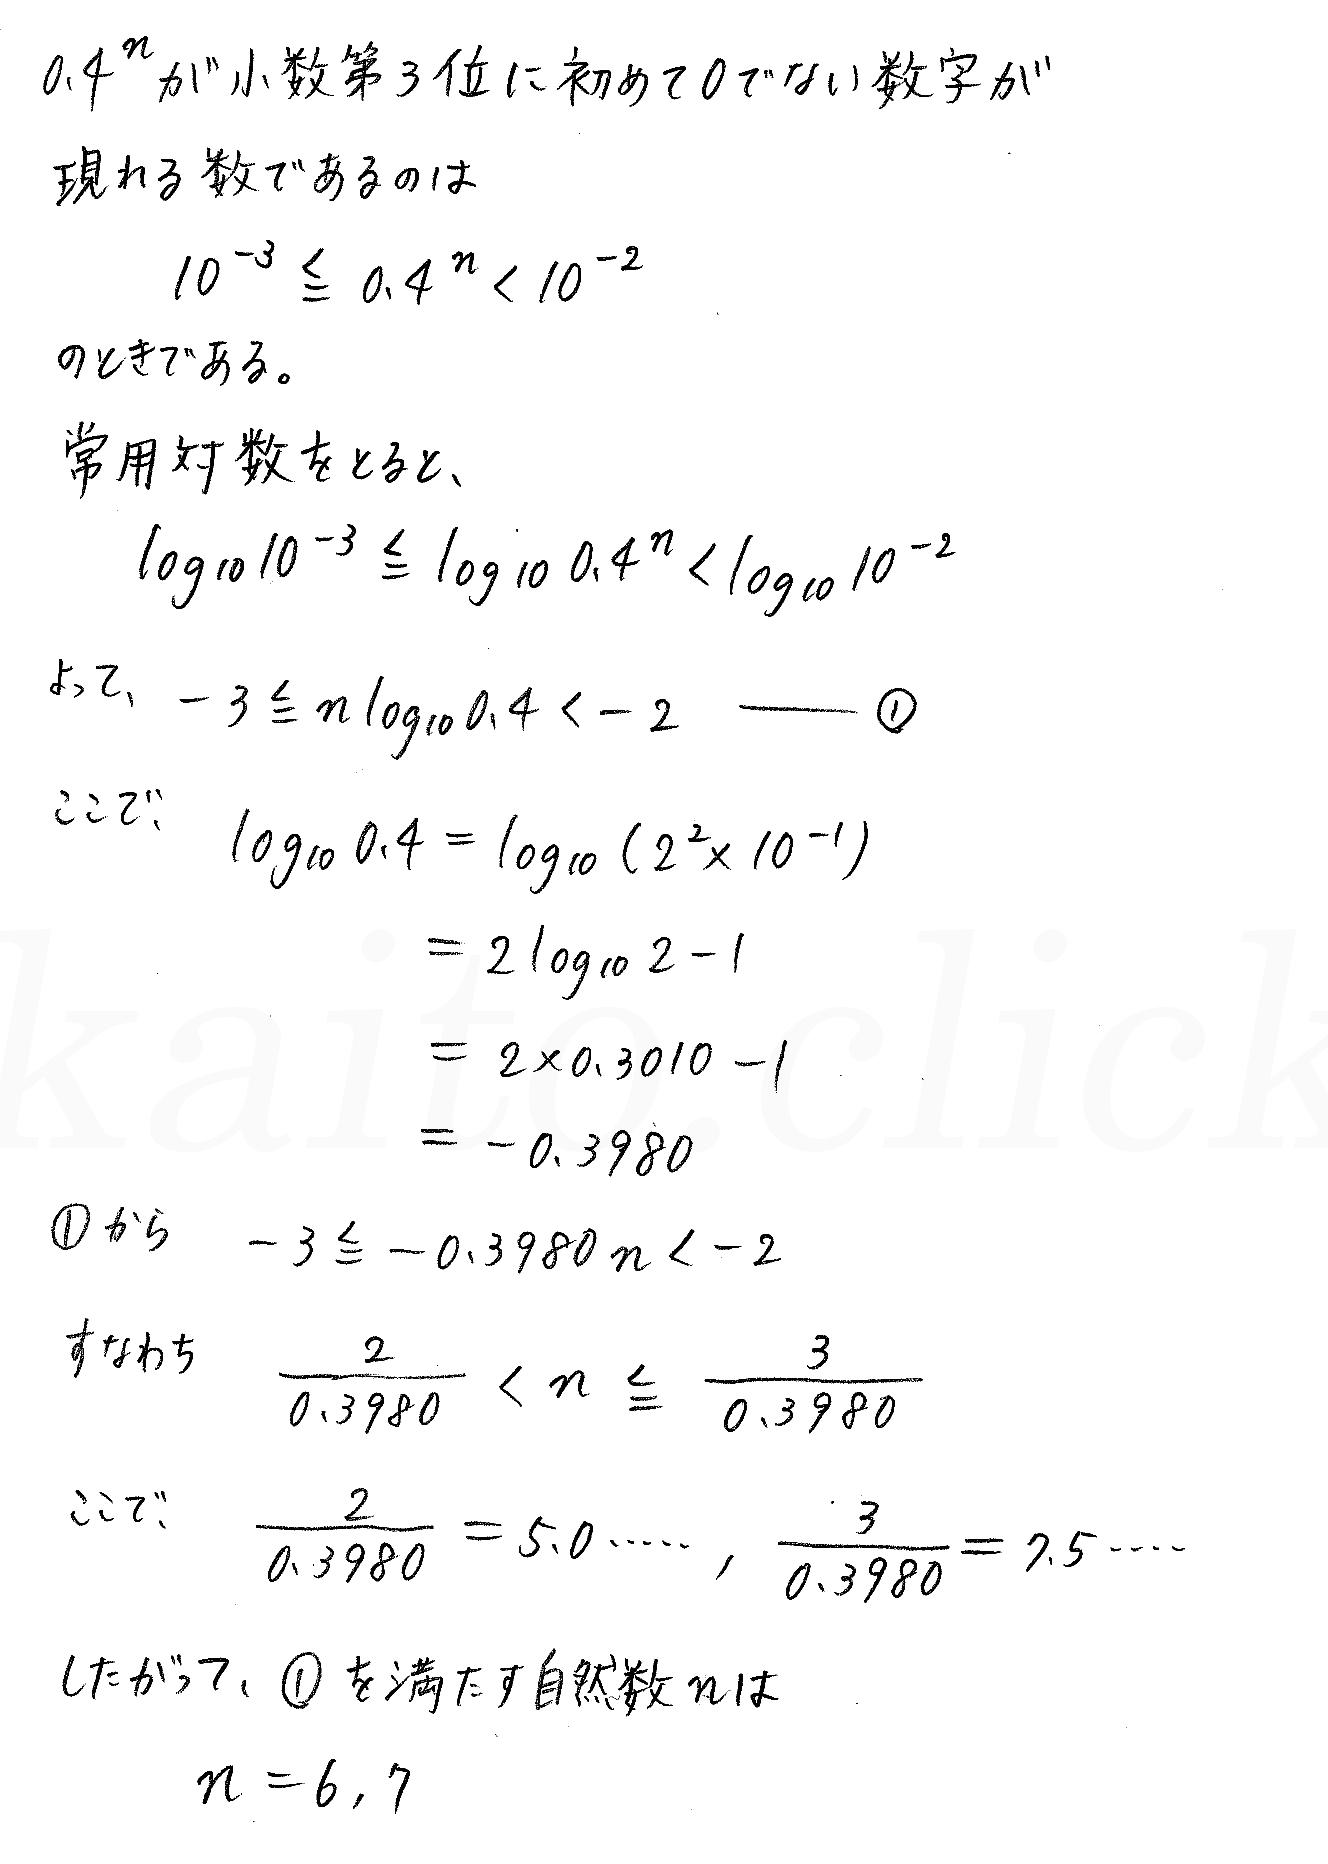 3TRIAL数学2-348解答